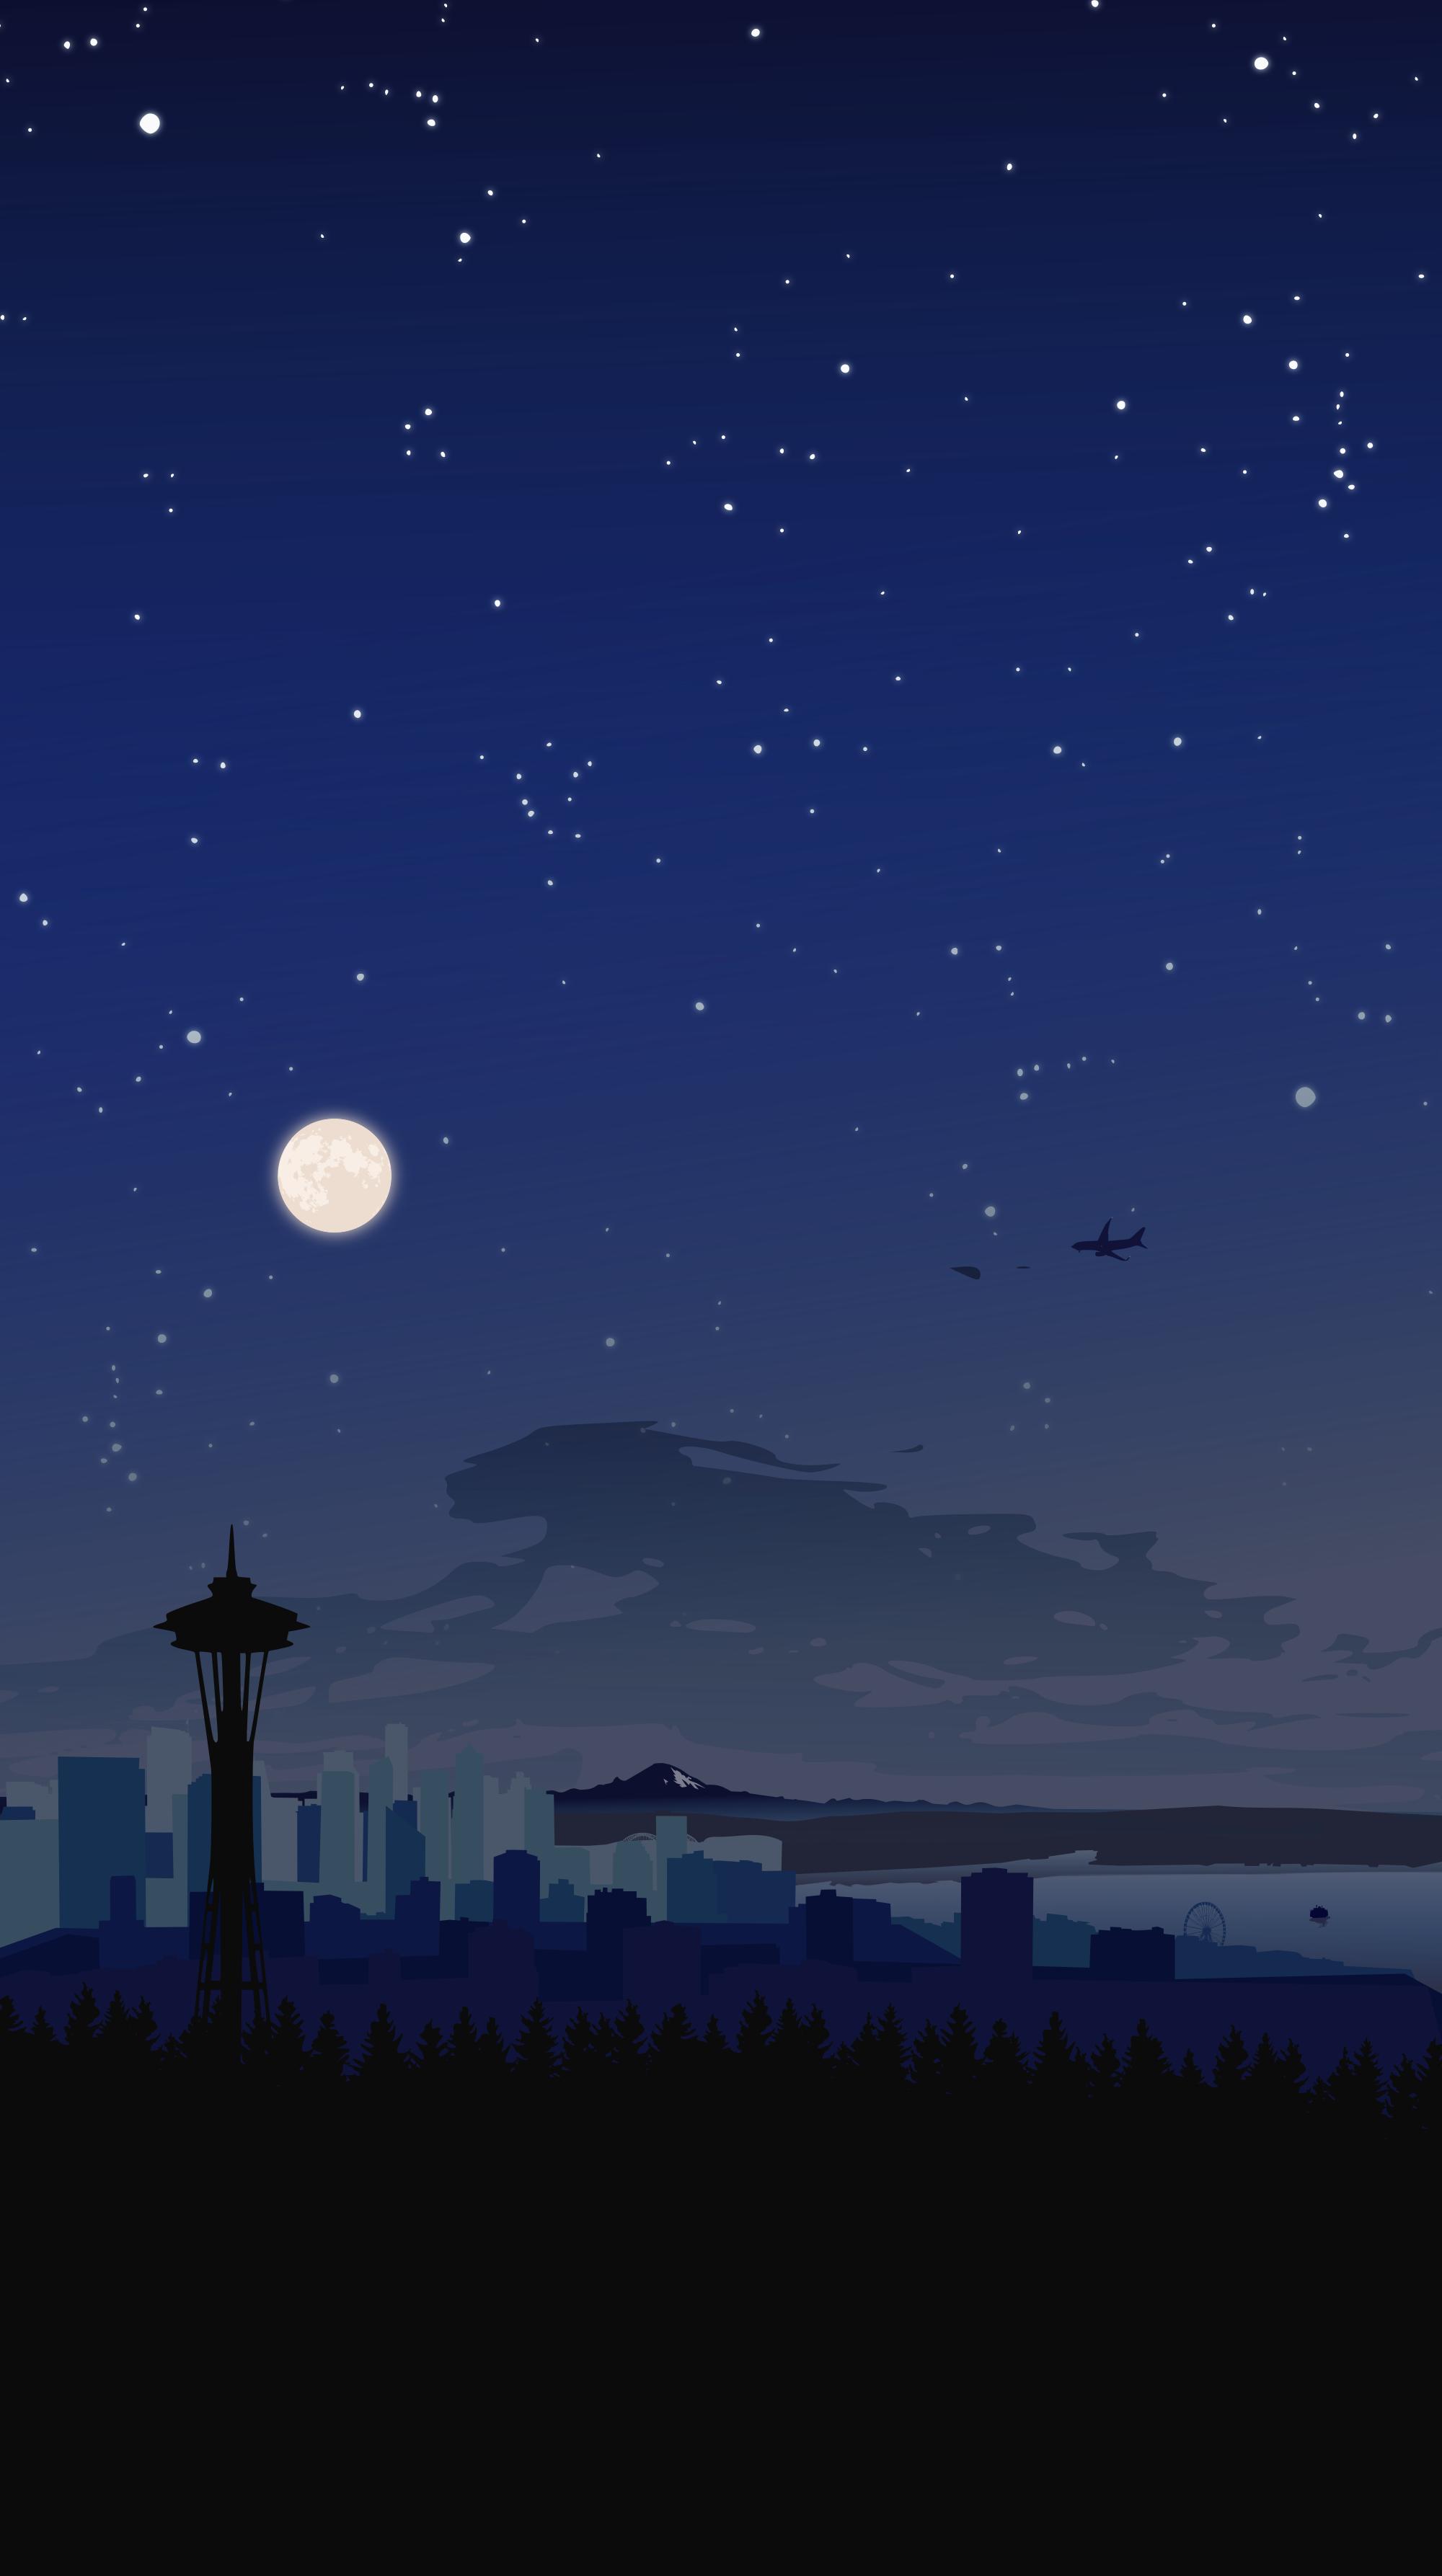 Night Seattle Skyline Wallpaper Smart Phone Wallpapers 4kphonewallpapersreddit Iphonewallpap Scenery Wallpaper Landscape Wallpaper Anime Scenery Wallpaper